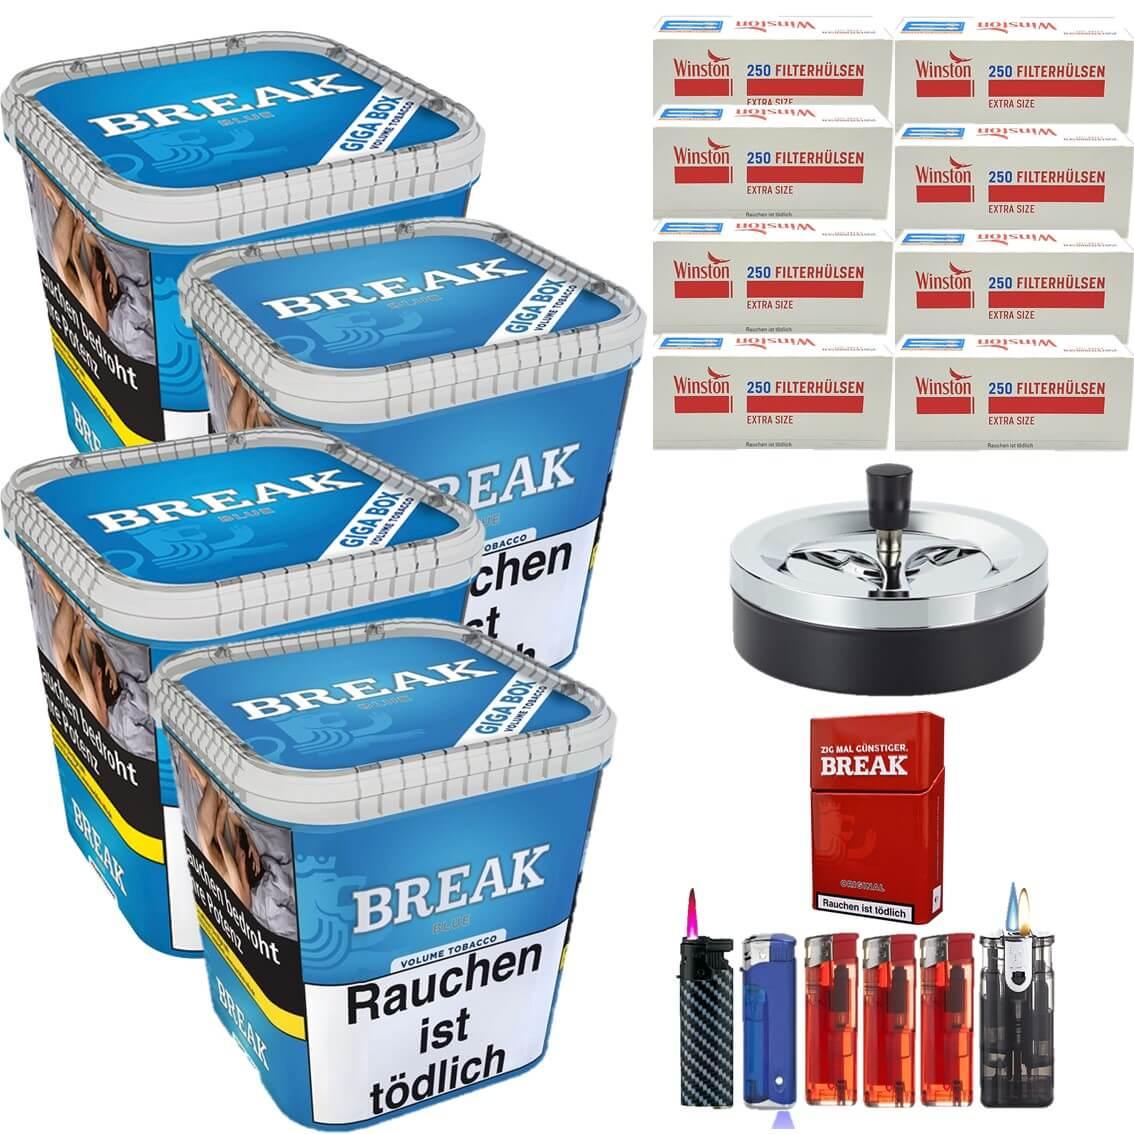 Break Blue / Blau 4 x 230g Volumentabak 2000 Extra Size Filterhülsen Uvm.